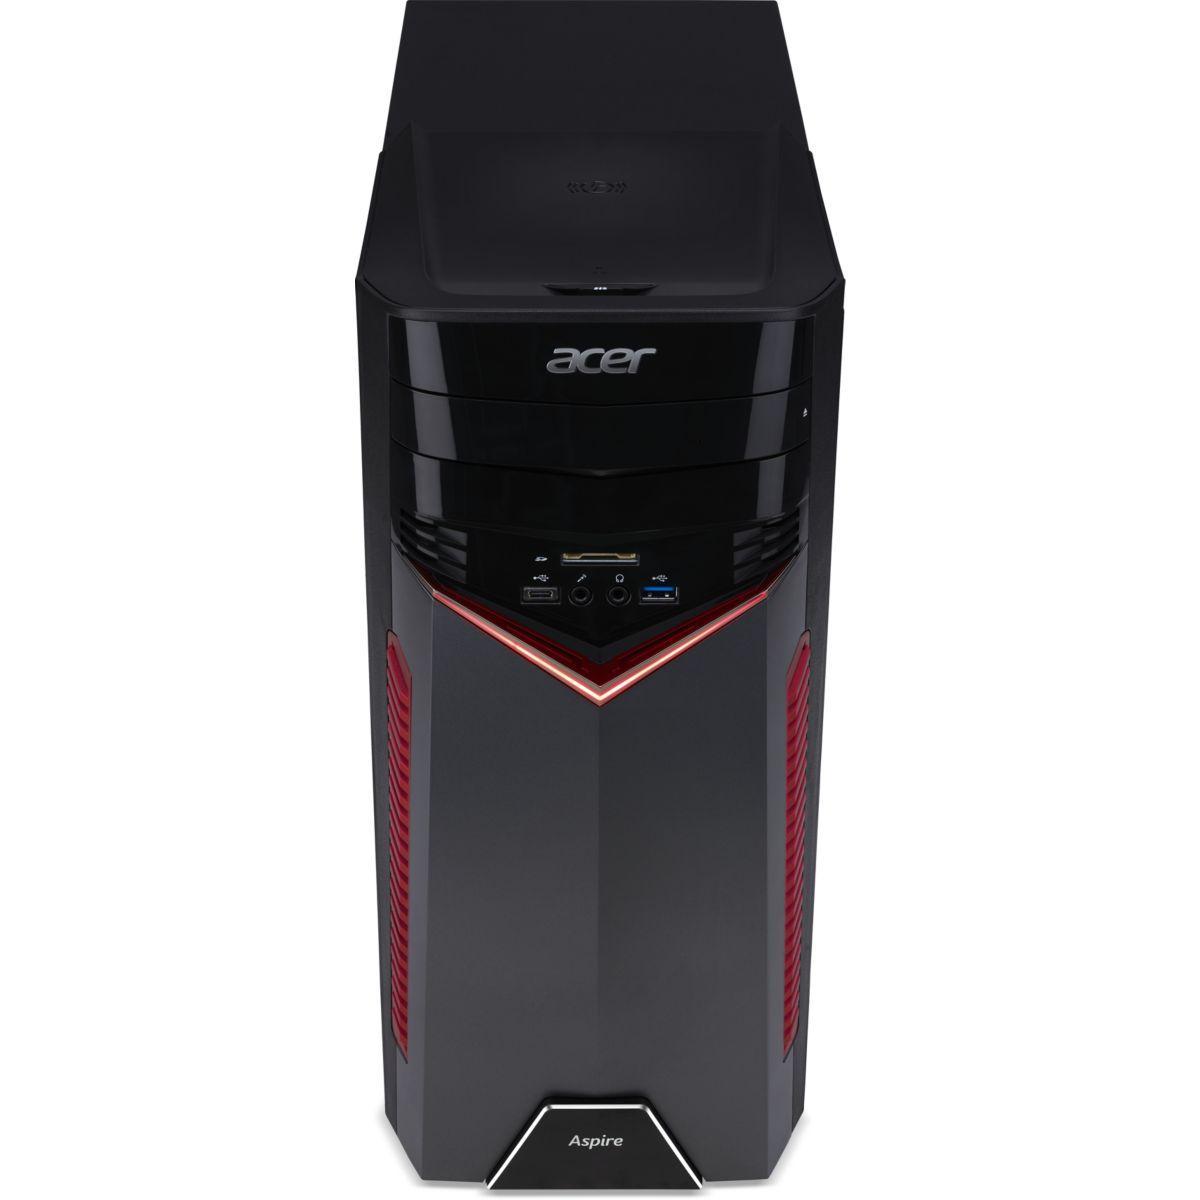 Pc gamer acer aspire gx-781-23 (photo)